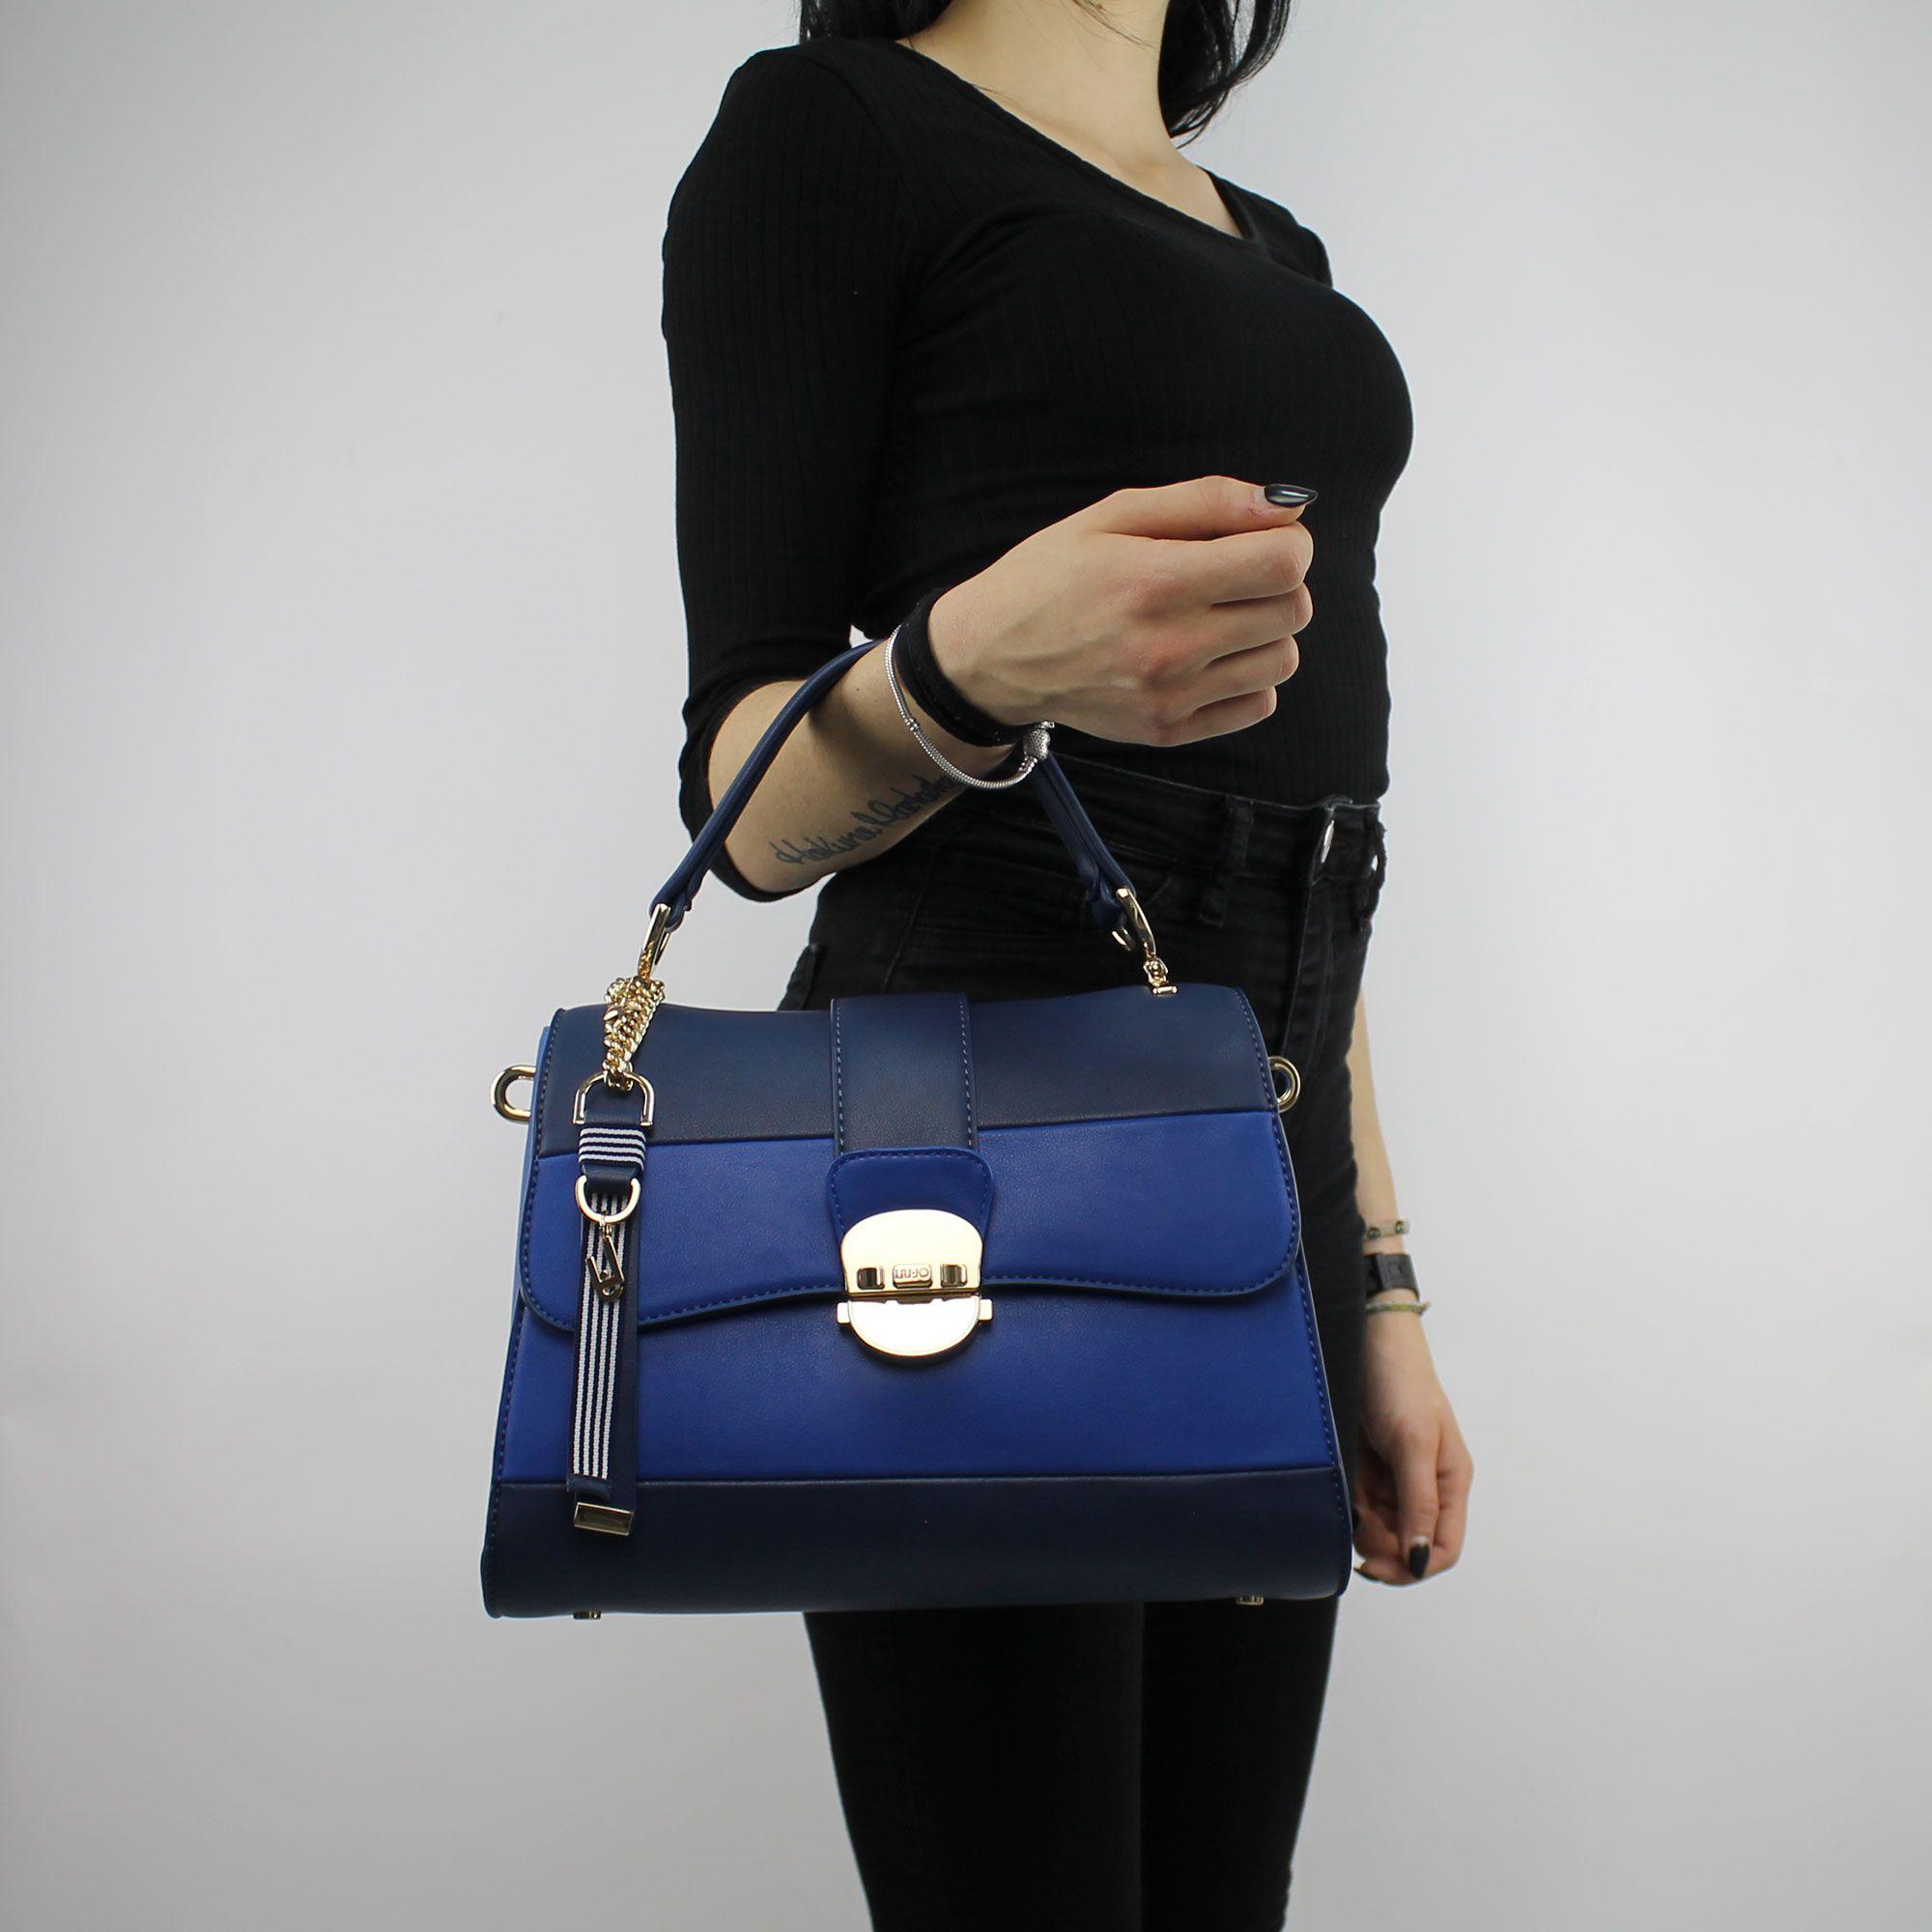 Shoulder bag Liu Jo, the handle to the top, Kansas, black